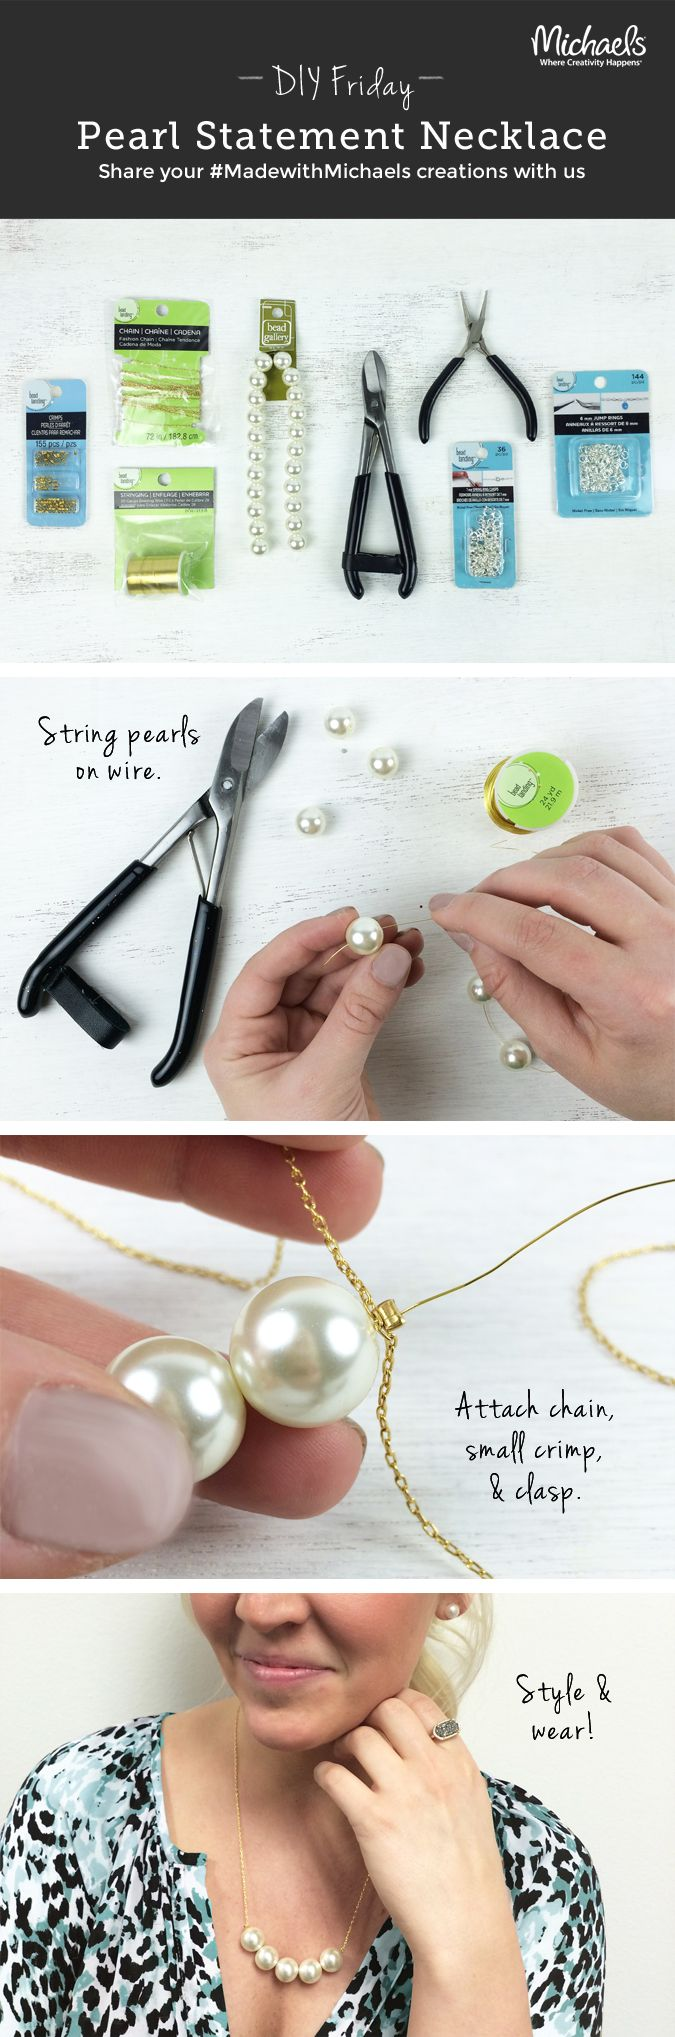 DIYFriday DIY Pearl Statement Necklace